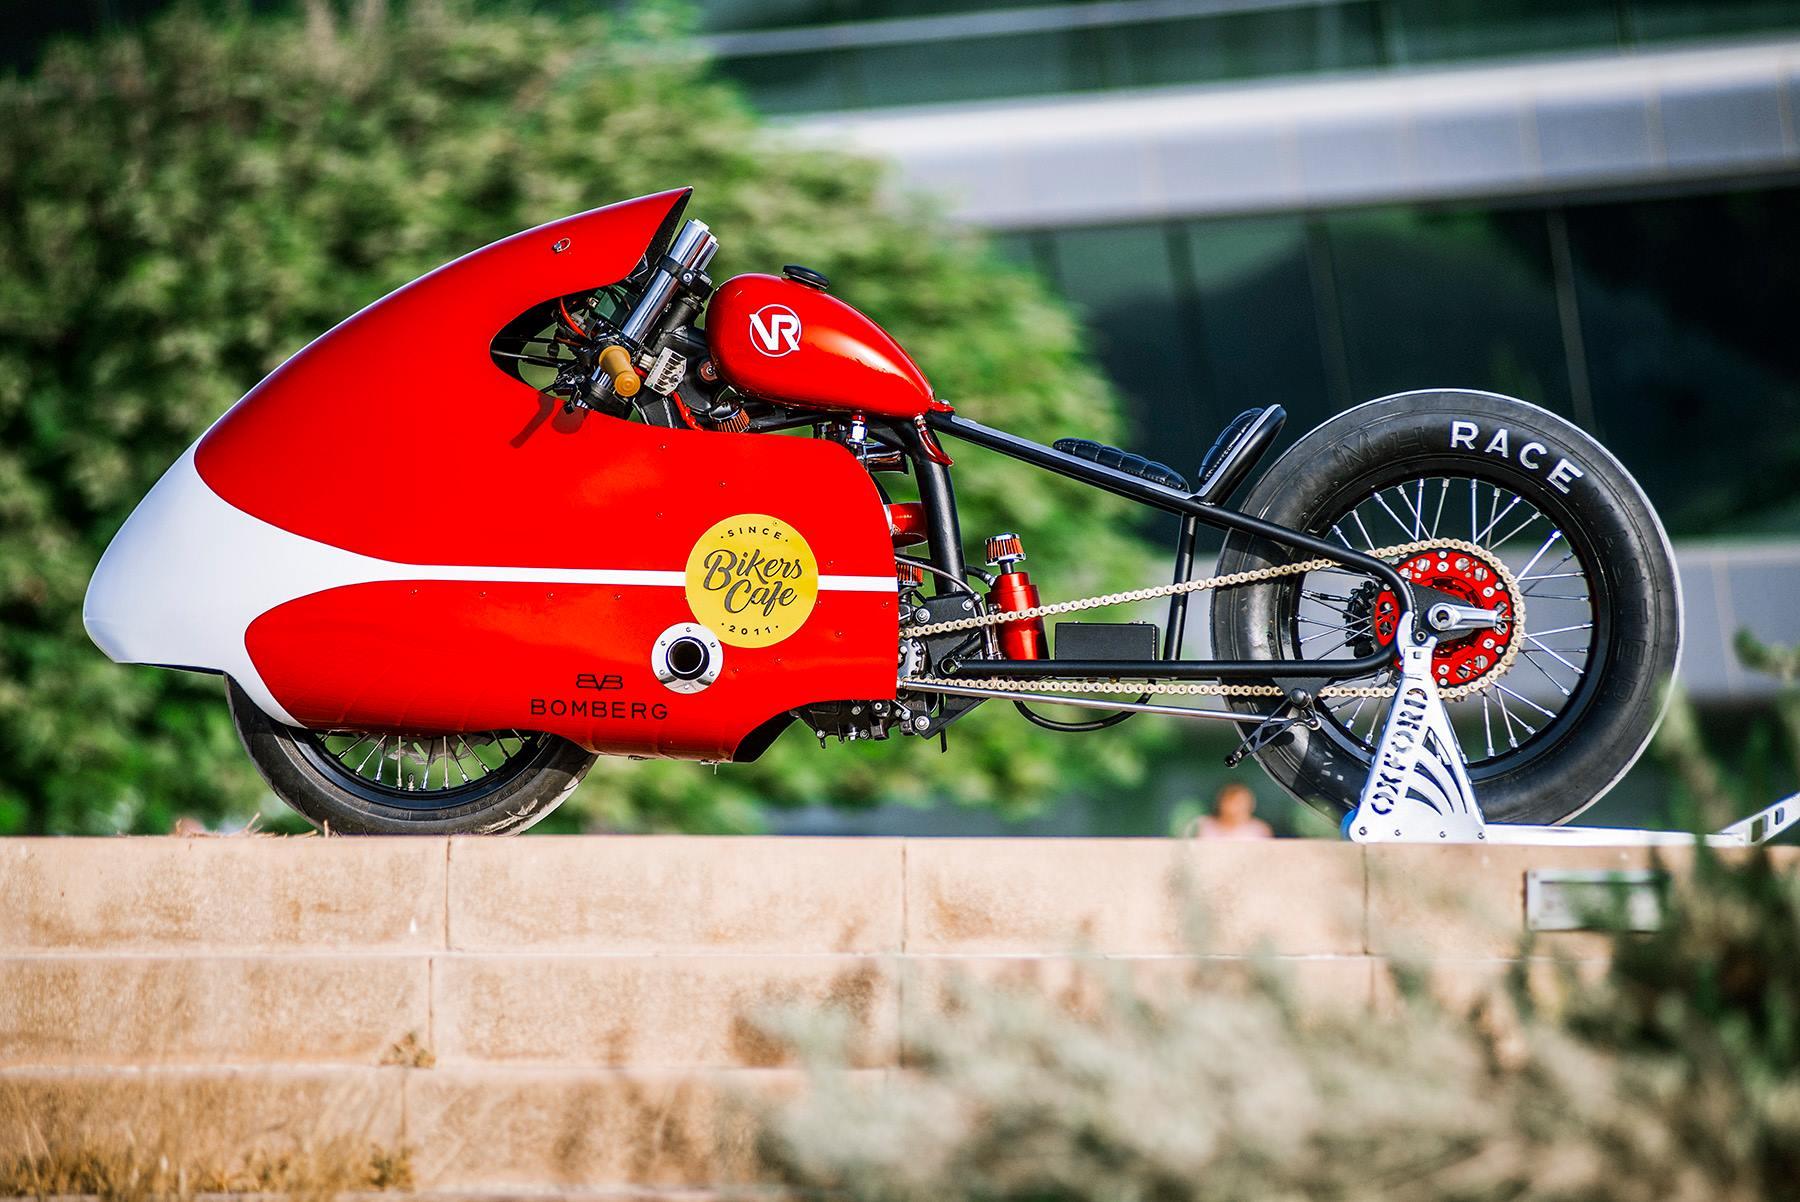 CafeRacer-Ducati 996-Project X- VR Custom27